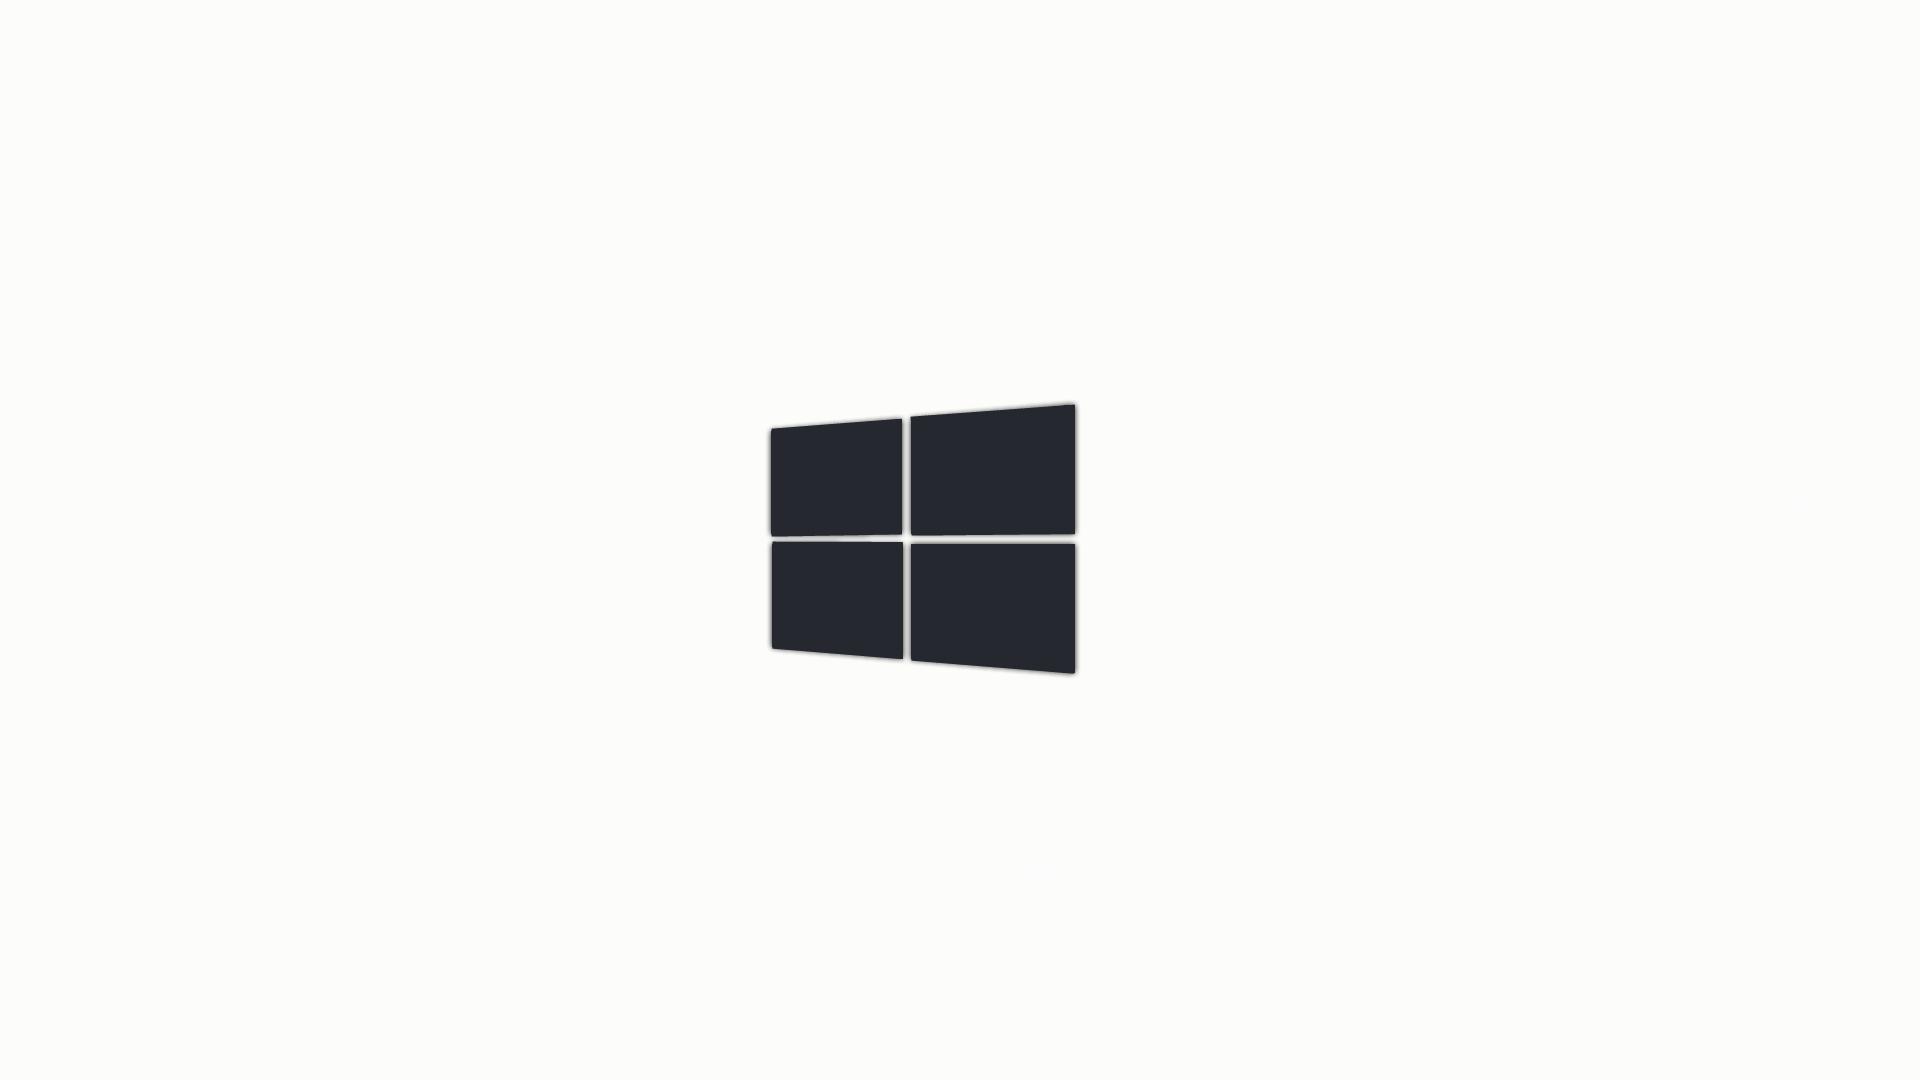 Windows 8 White/Dark Gray Logo By AnimeMaster55 On DeviantArt